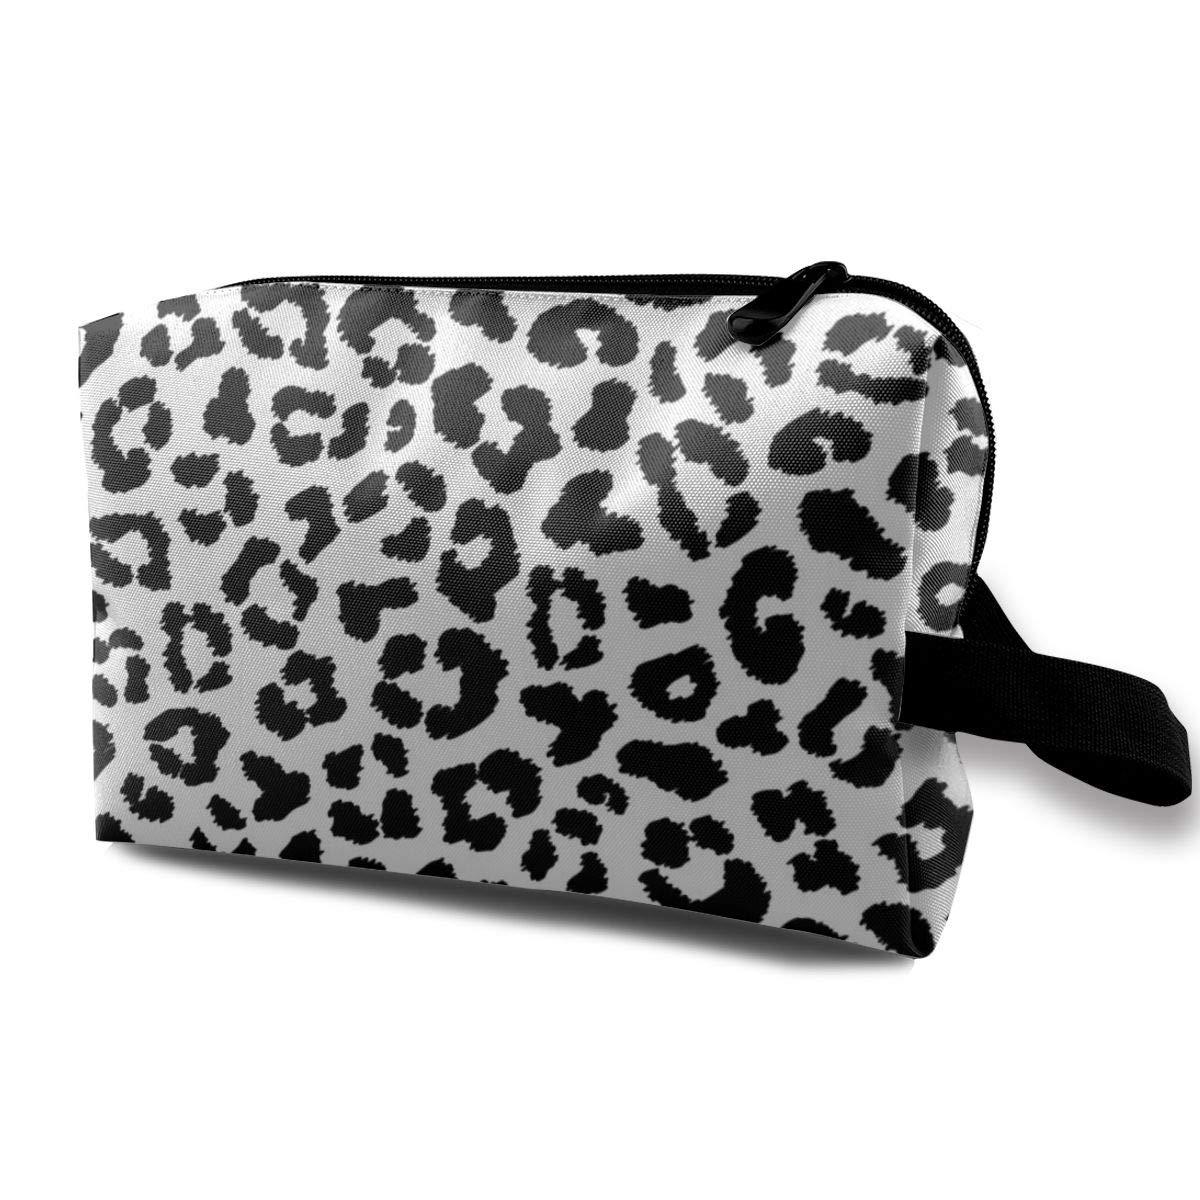 Black And White Leopard Fur Canvas Makeup Bag Pouch Purse Handbag Organizer with Zipper